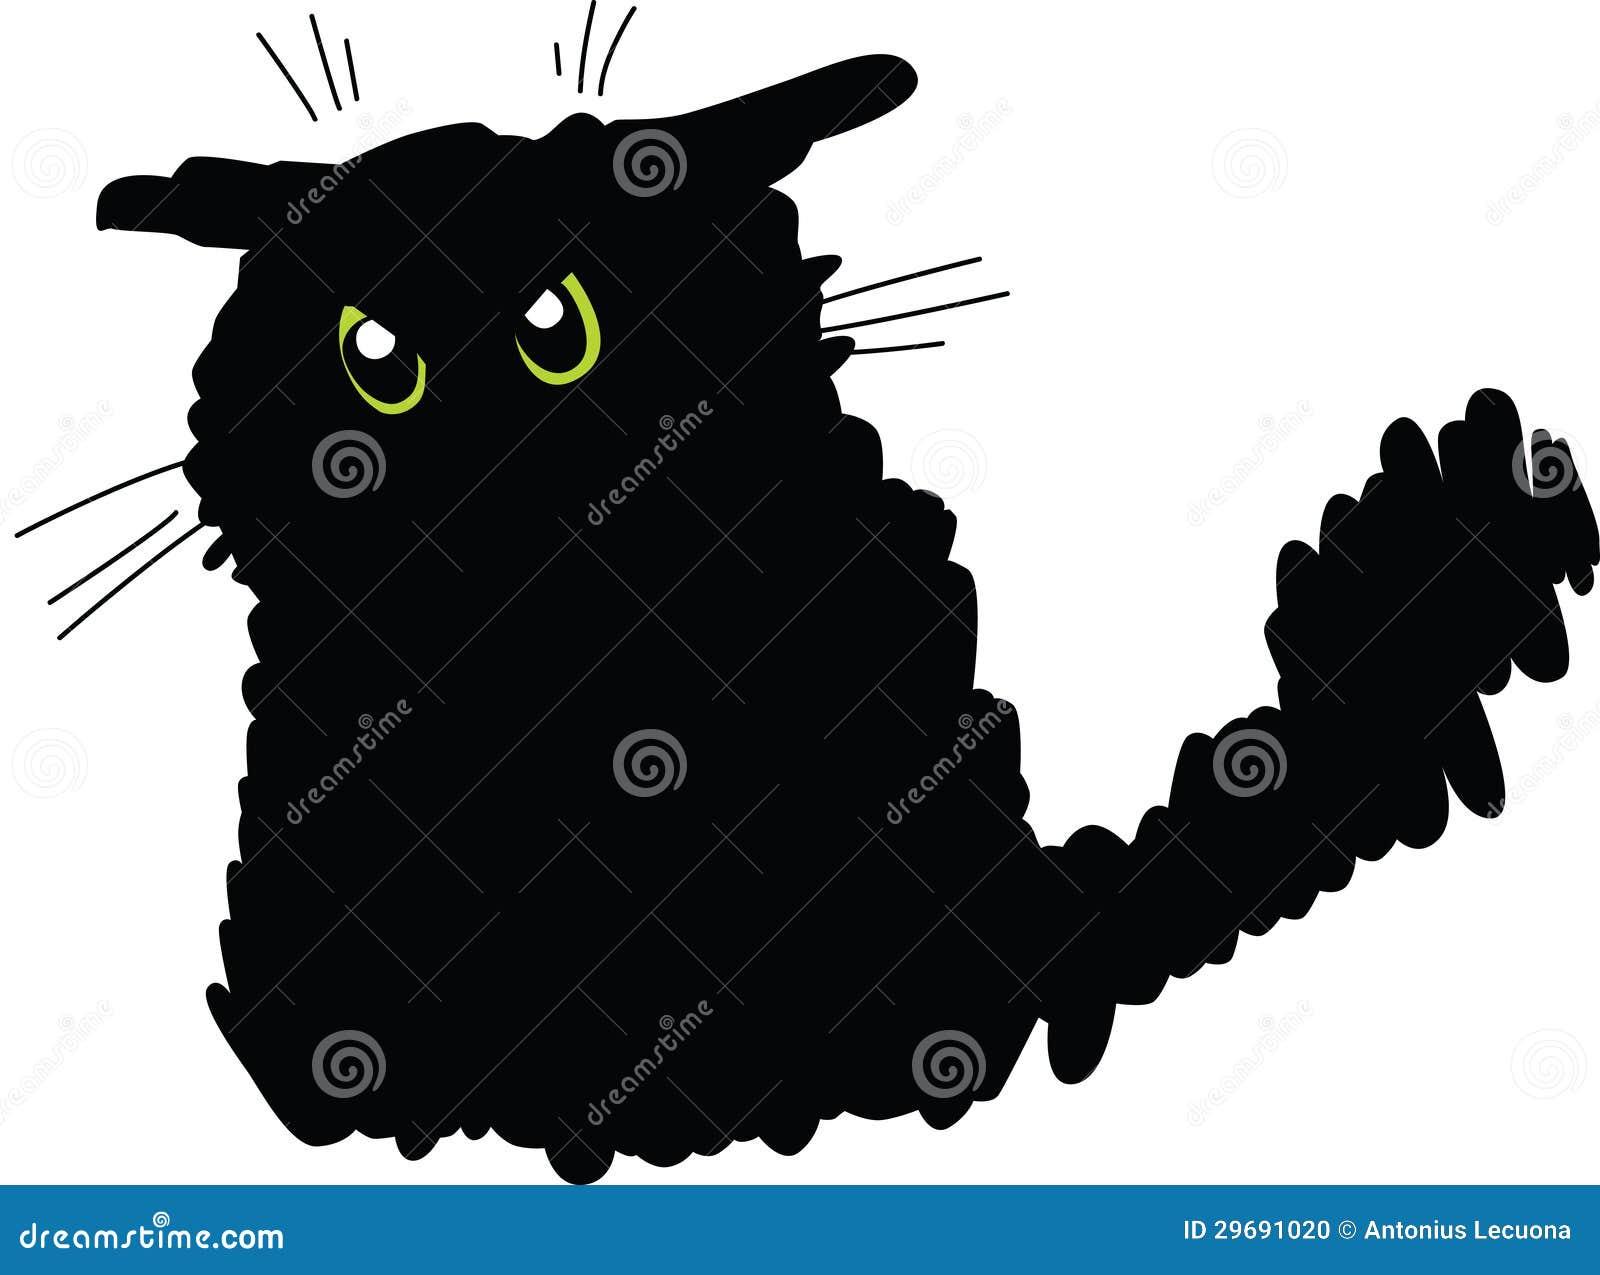 Grumpy black cat stock vector. Image of whiskers, cartoon ...